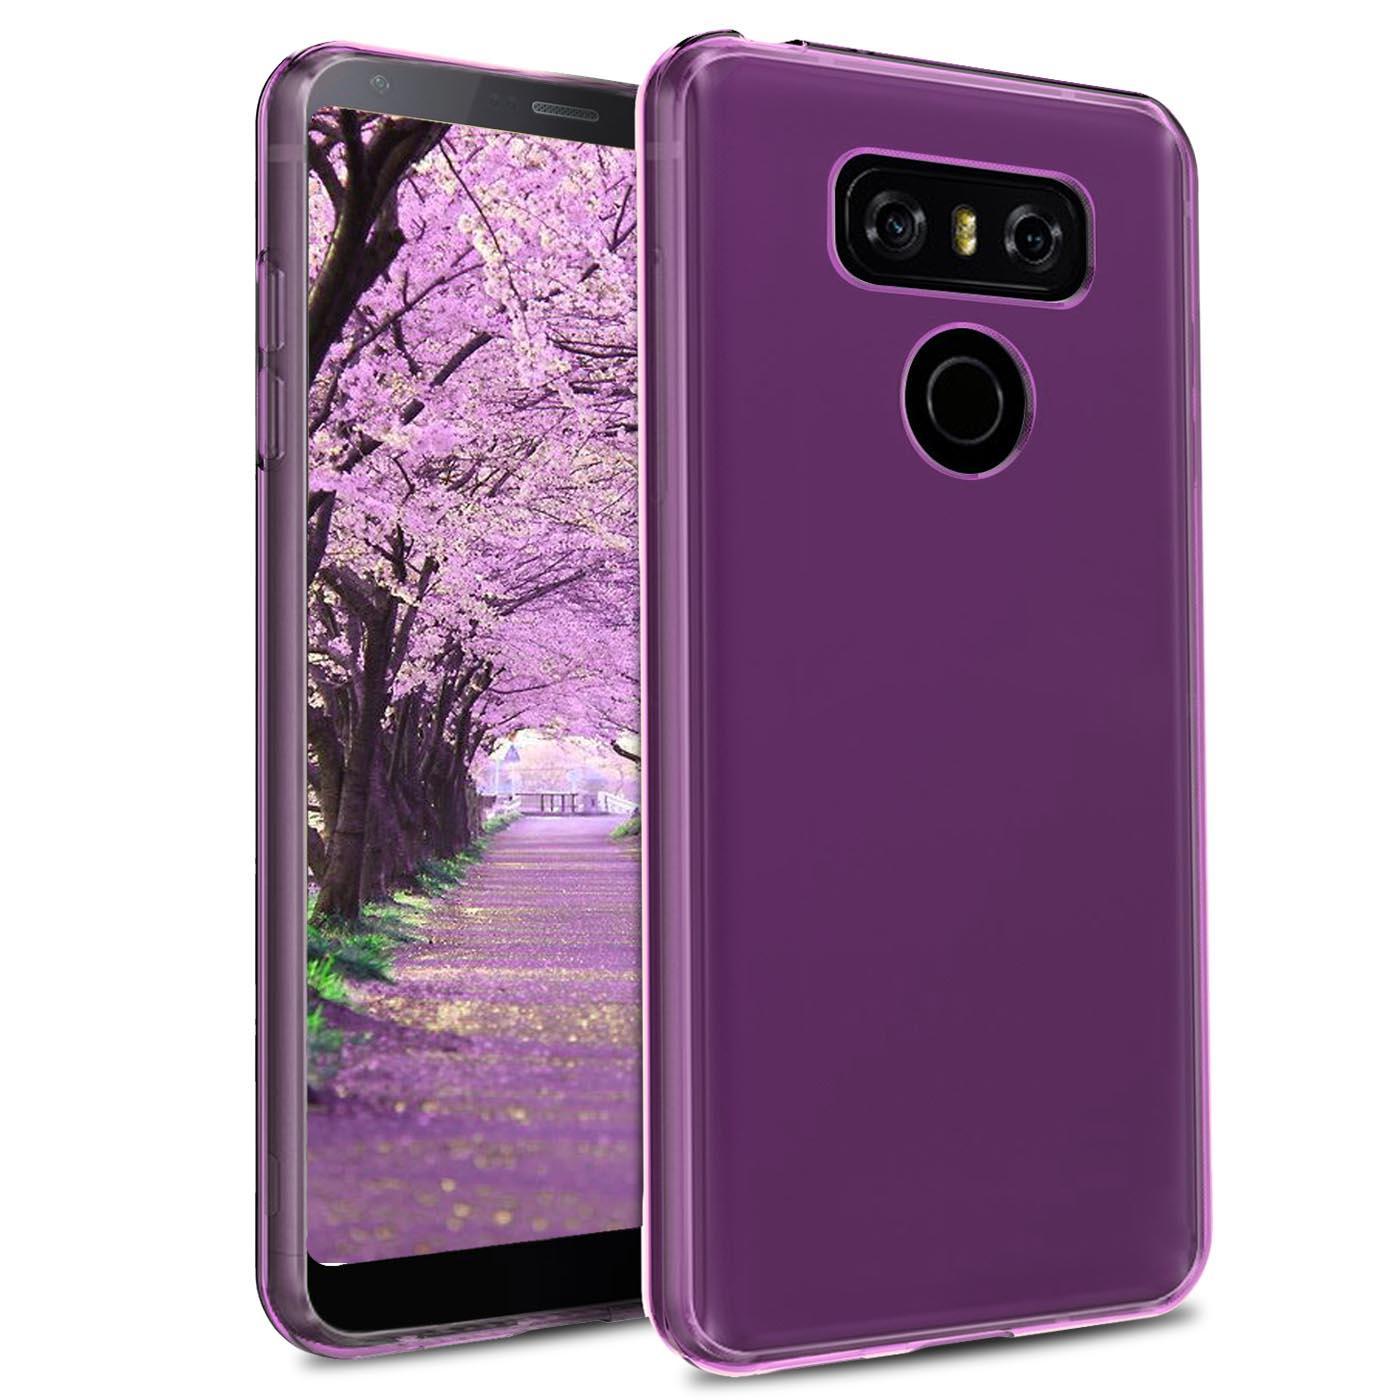 TPU LG G6 Case